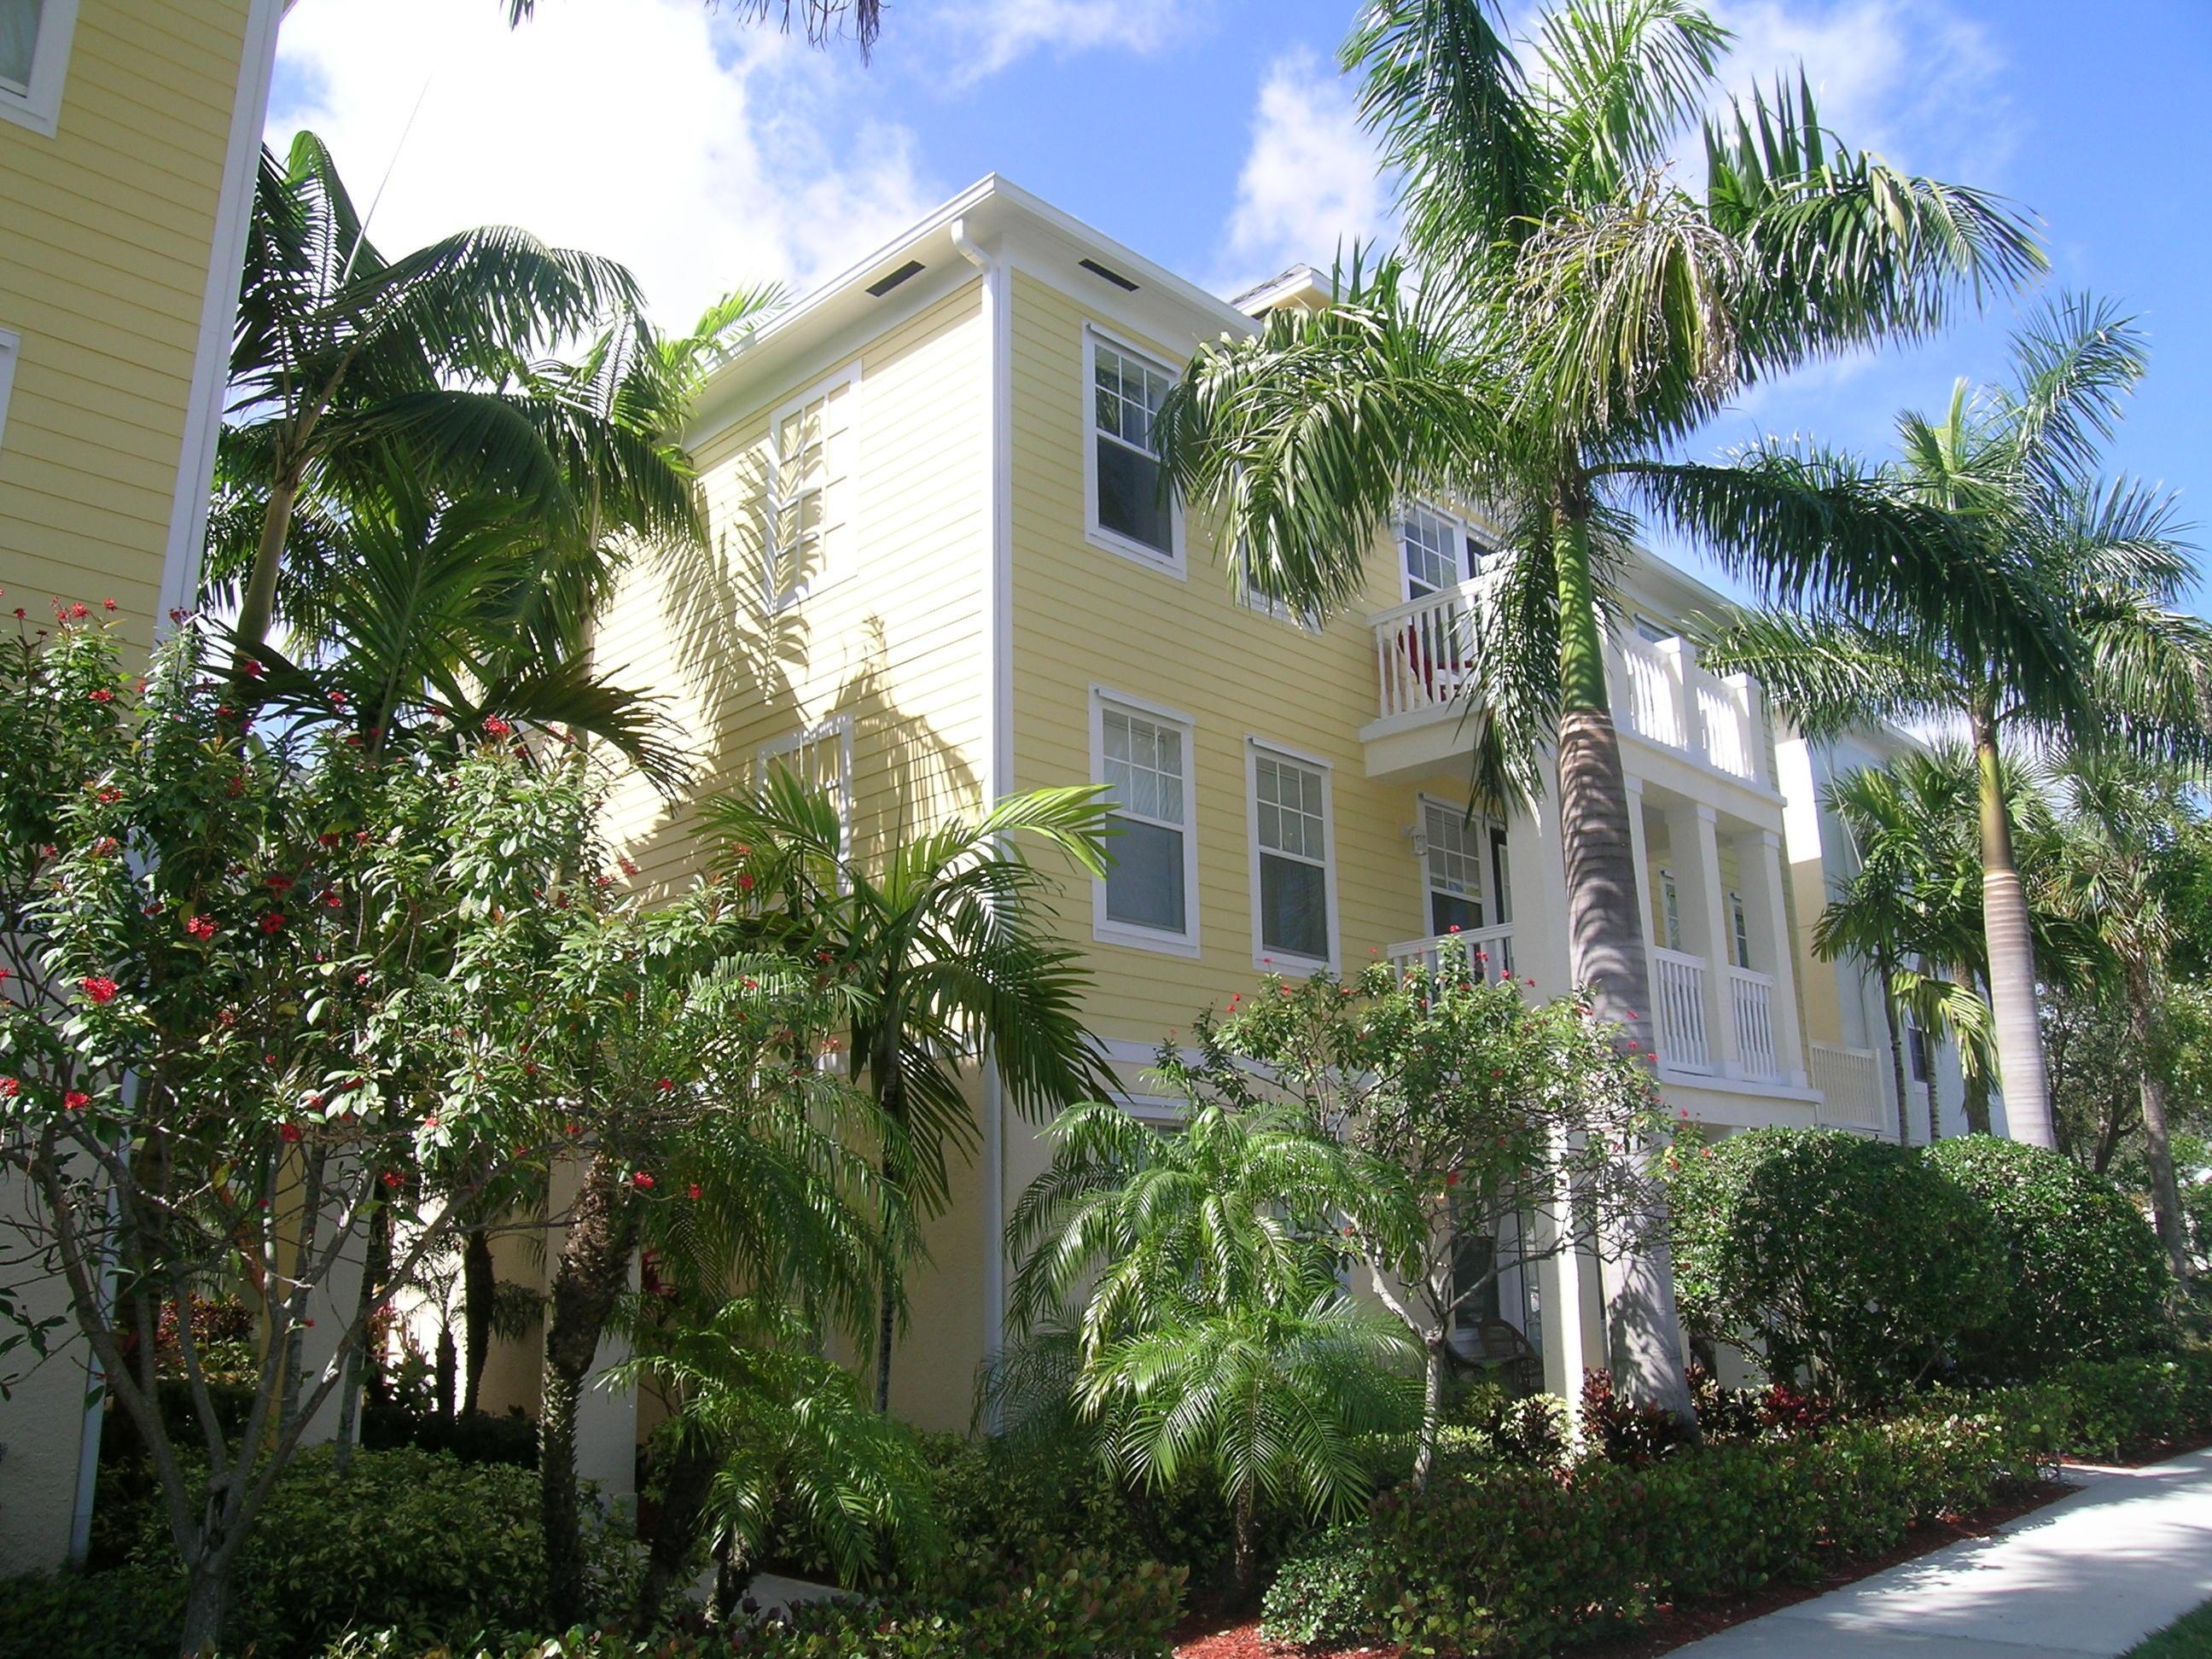 275 Murcia Drive 213, Jupiter, Florida 33458, 2 Bedrooms Bedrooms, ,2 BathroomsBathrooms,F,Condominium,Murcia,RX-10545447